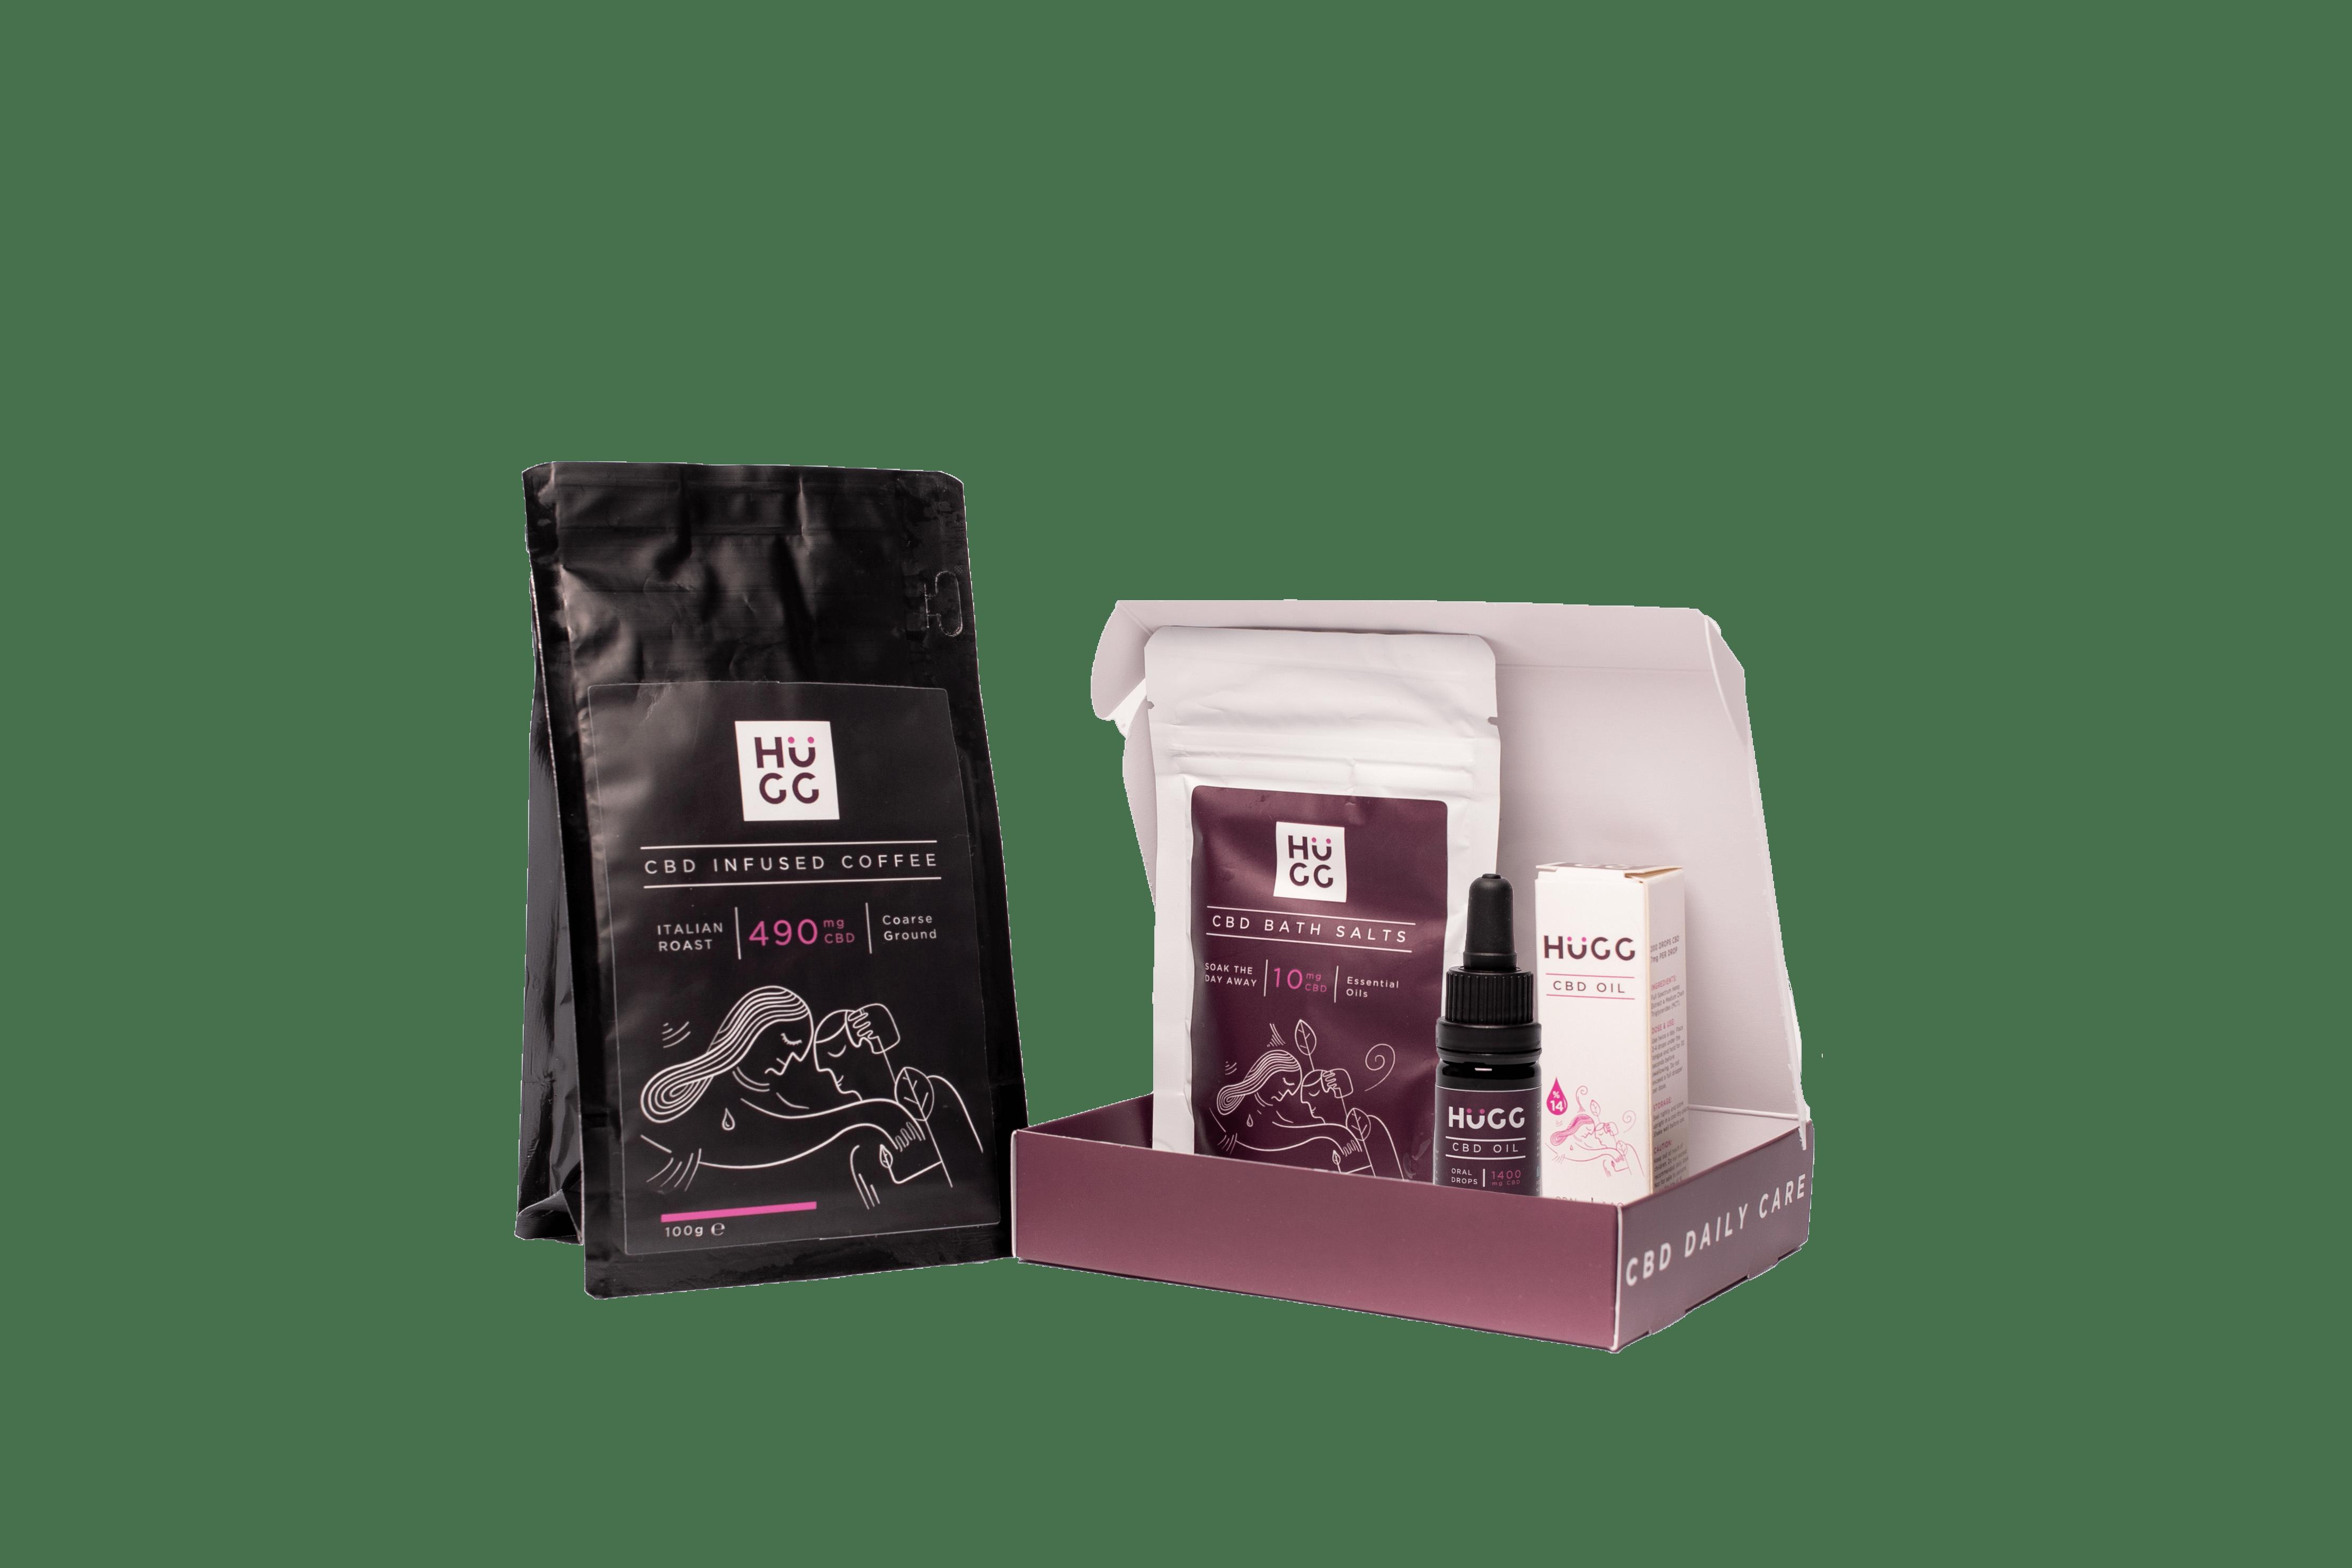 HuGG CBD Gift Kit with Free Coffee